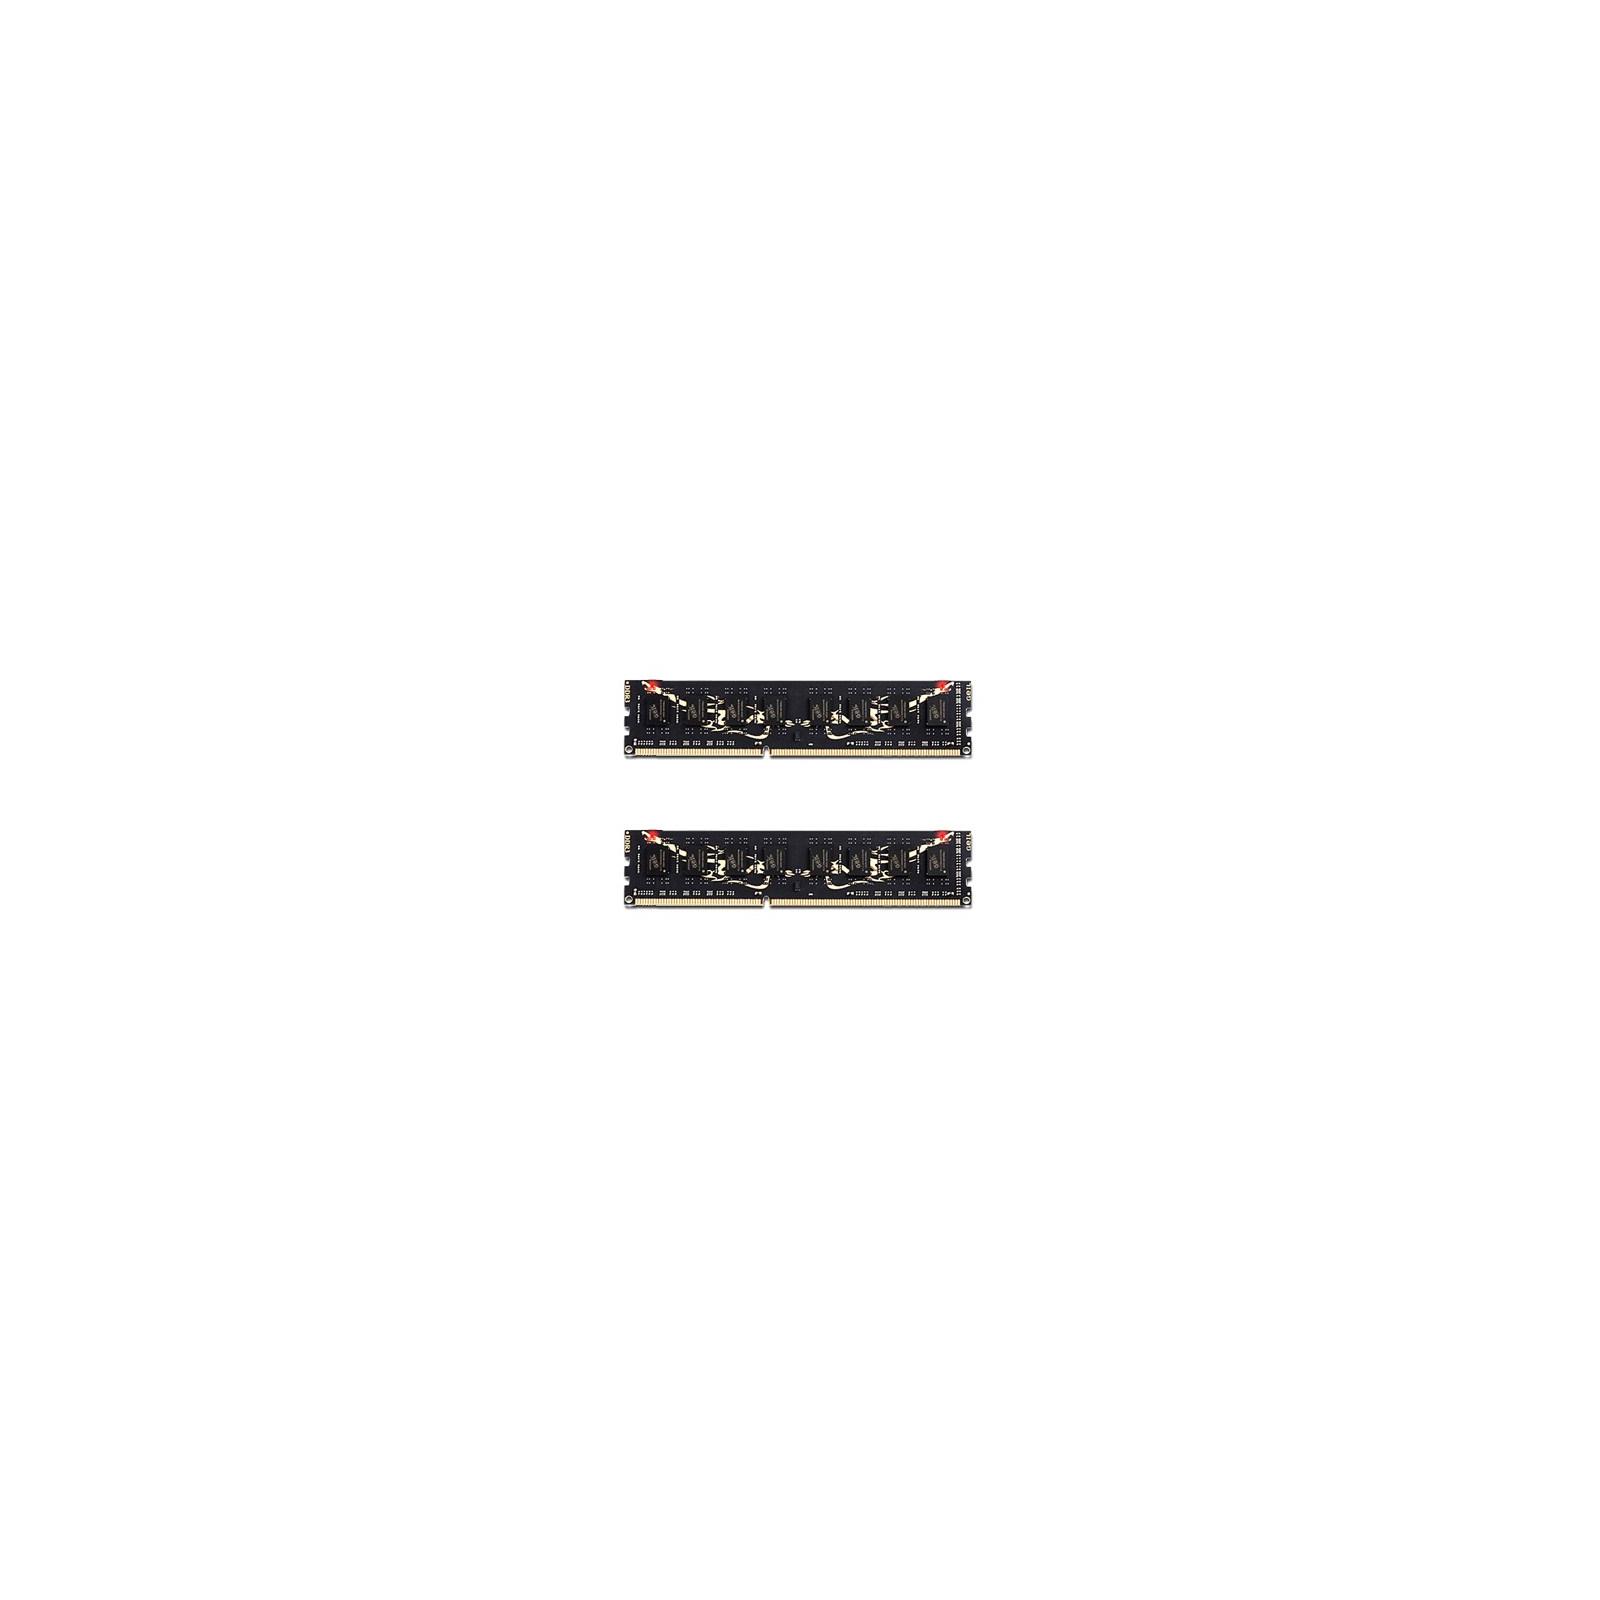 Модуль памяти для компьютера DDR3 16GB (2x8GB) 1600 MHz GEIL (GB316GB1600C10DC)